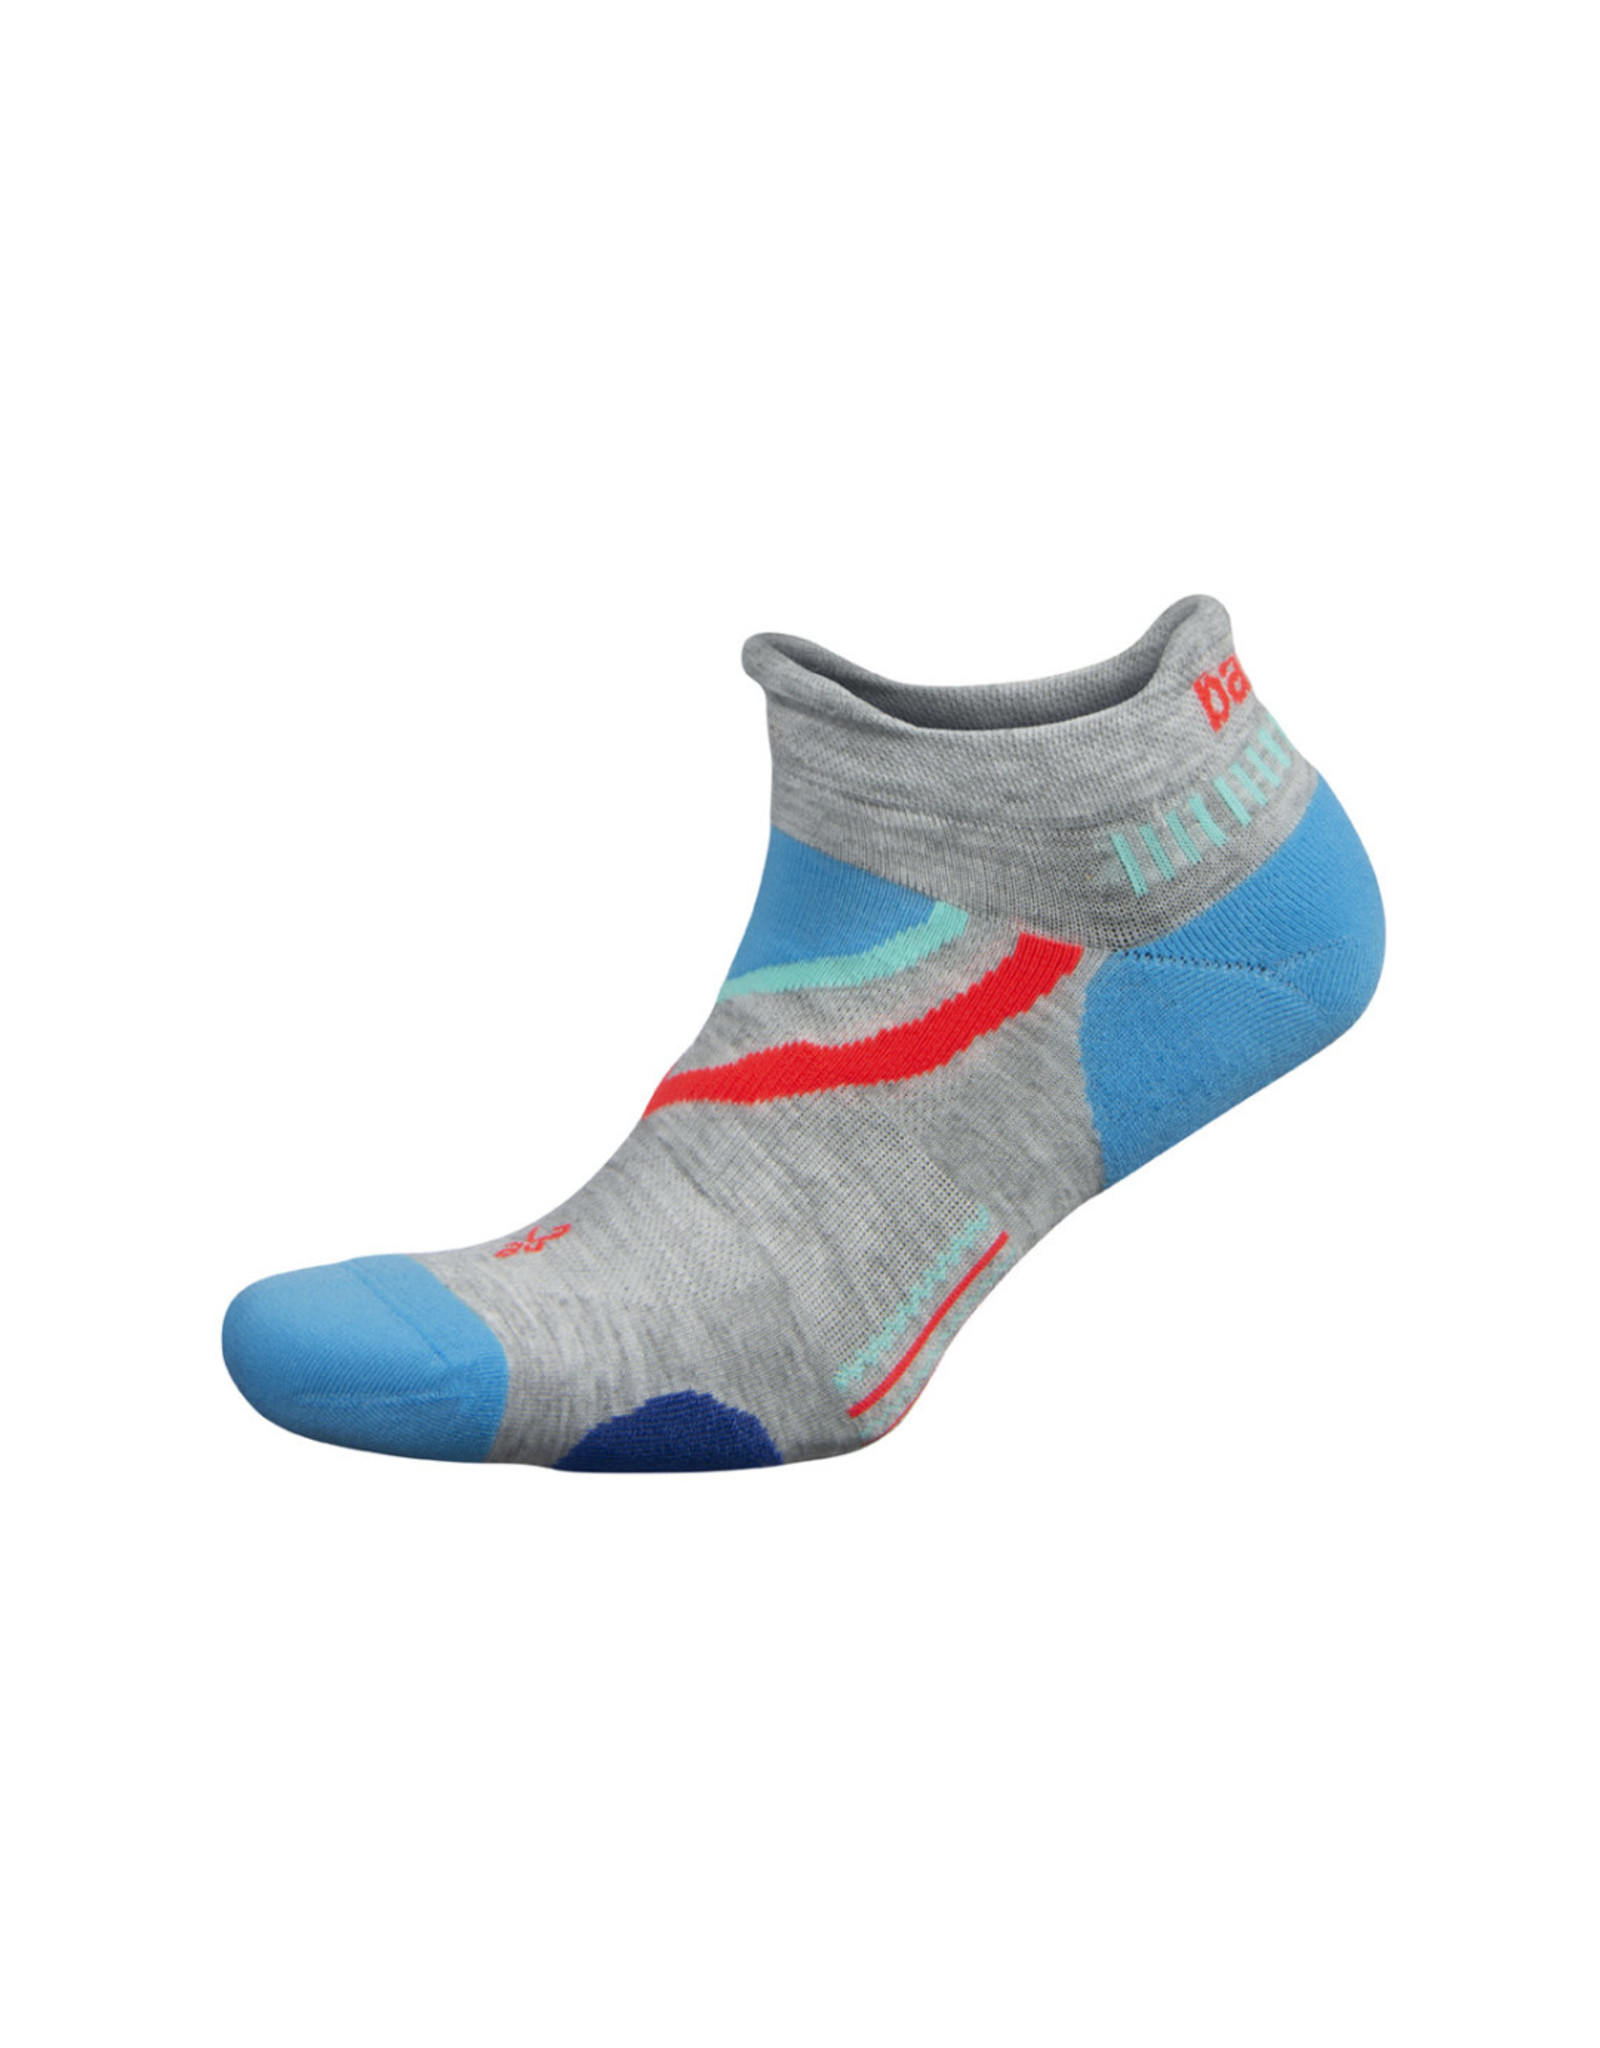 Balega Balega UltraGlide Running Sock